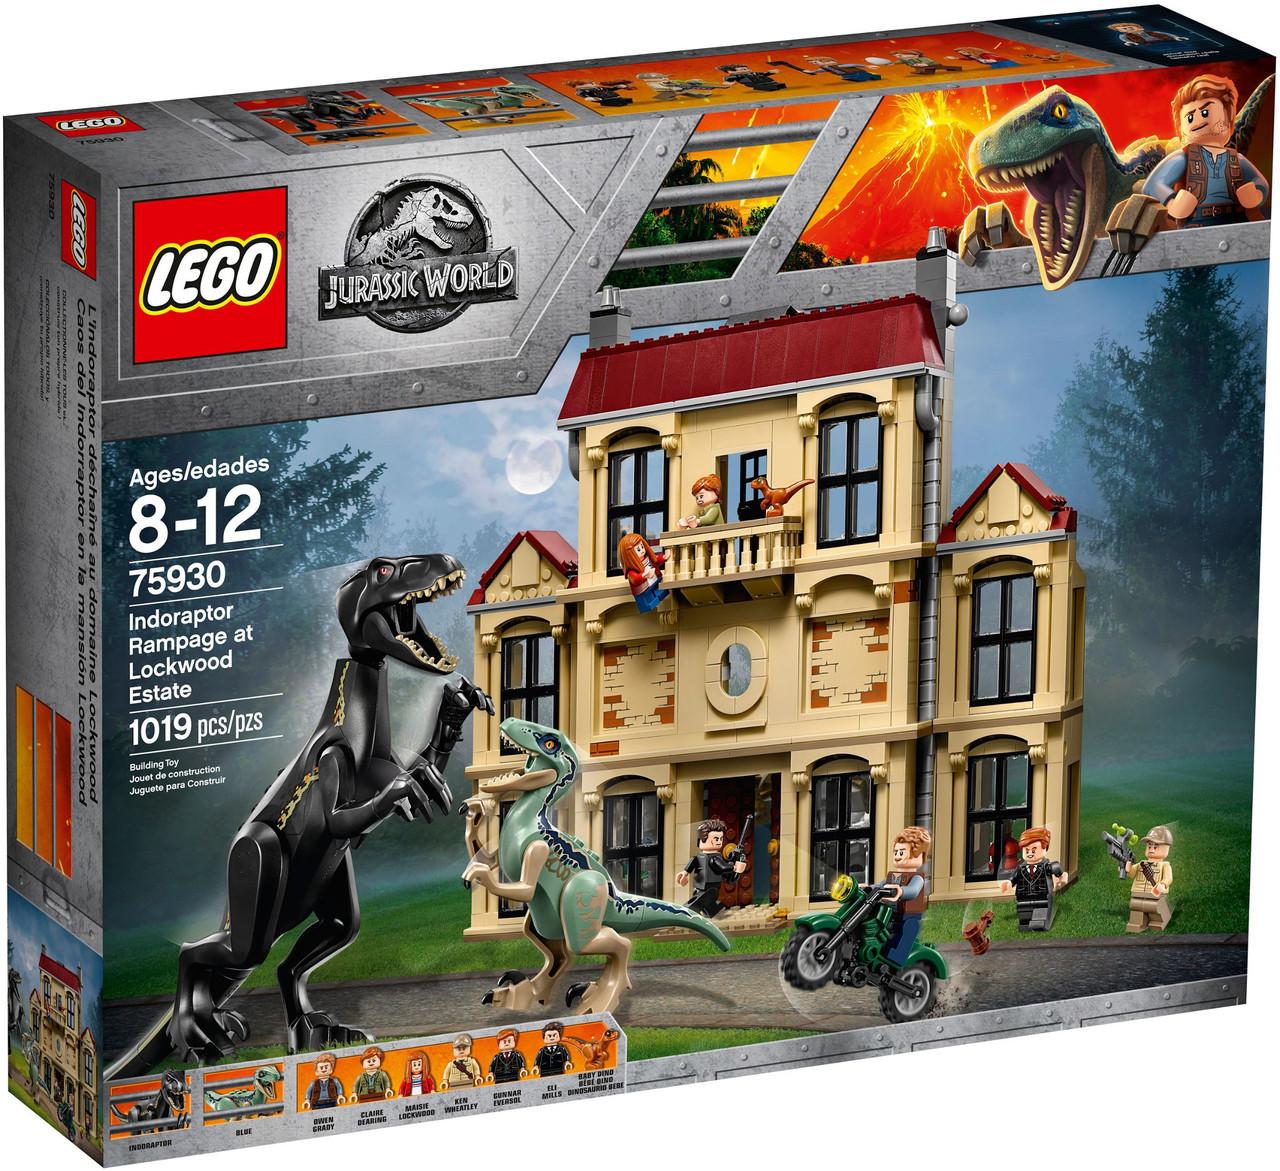 Lego Jurassic World Напад Индораптора в маєтку Локвуд 75930